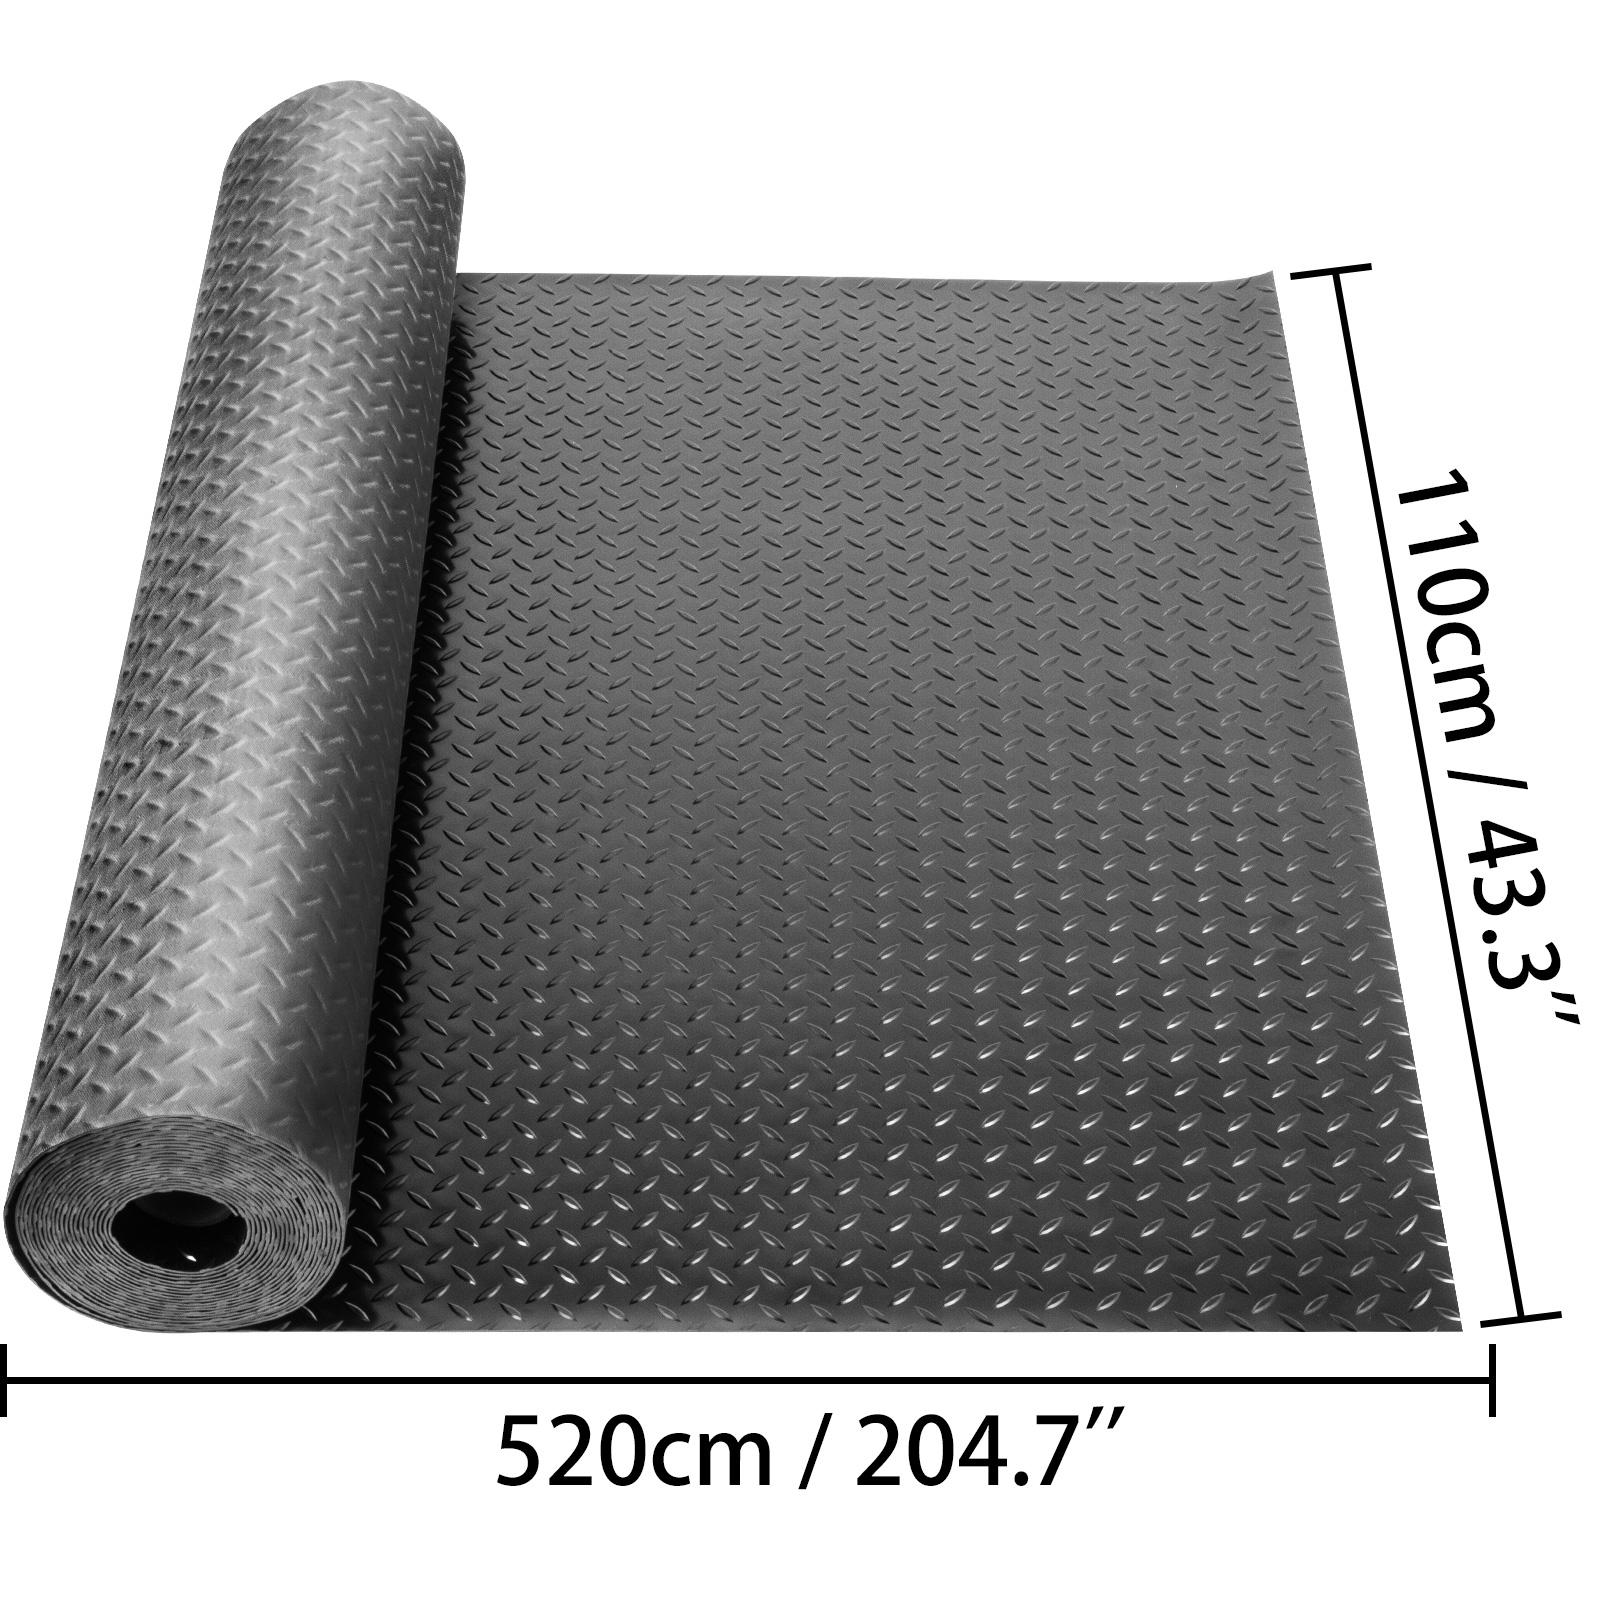 thumbnail 104 - Garage Flooring Mat Roll Car Trailer Floor Covering 1.1m Width Gym Floor Roll